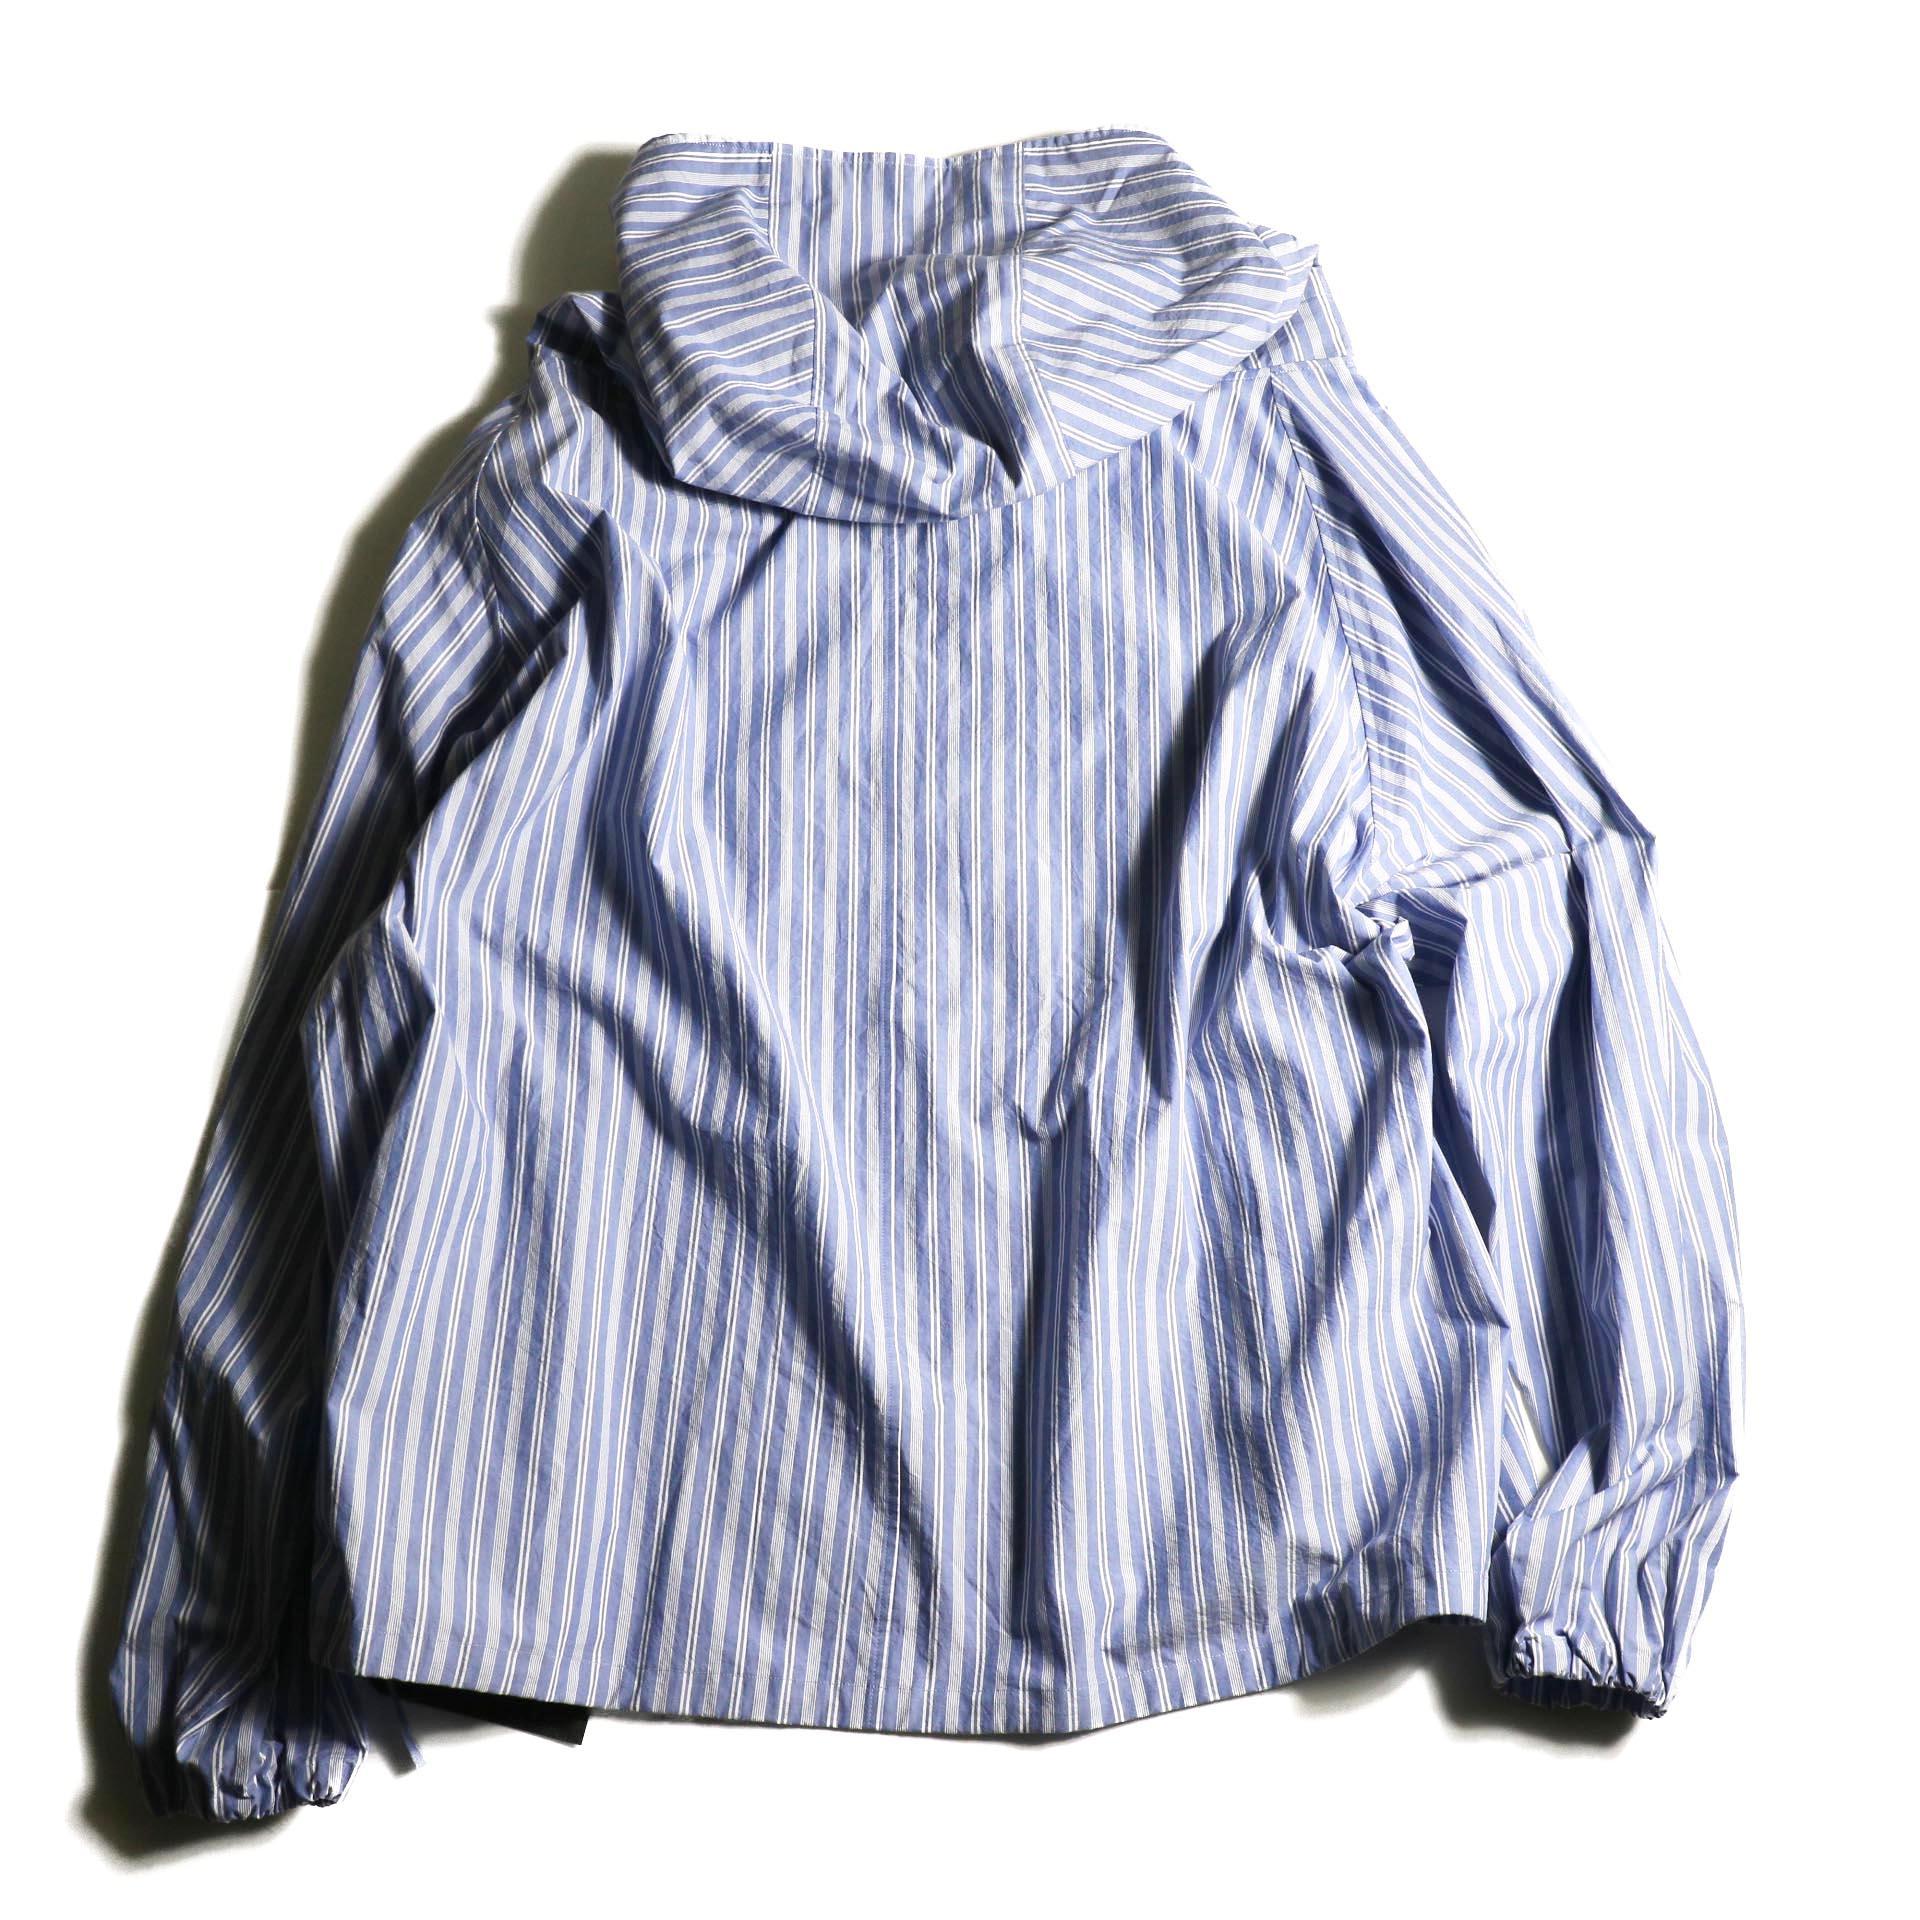 UNUSED / US1793 Shirt Anorak (Sax Stripe) 背面